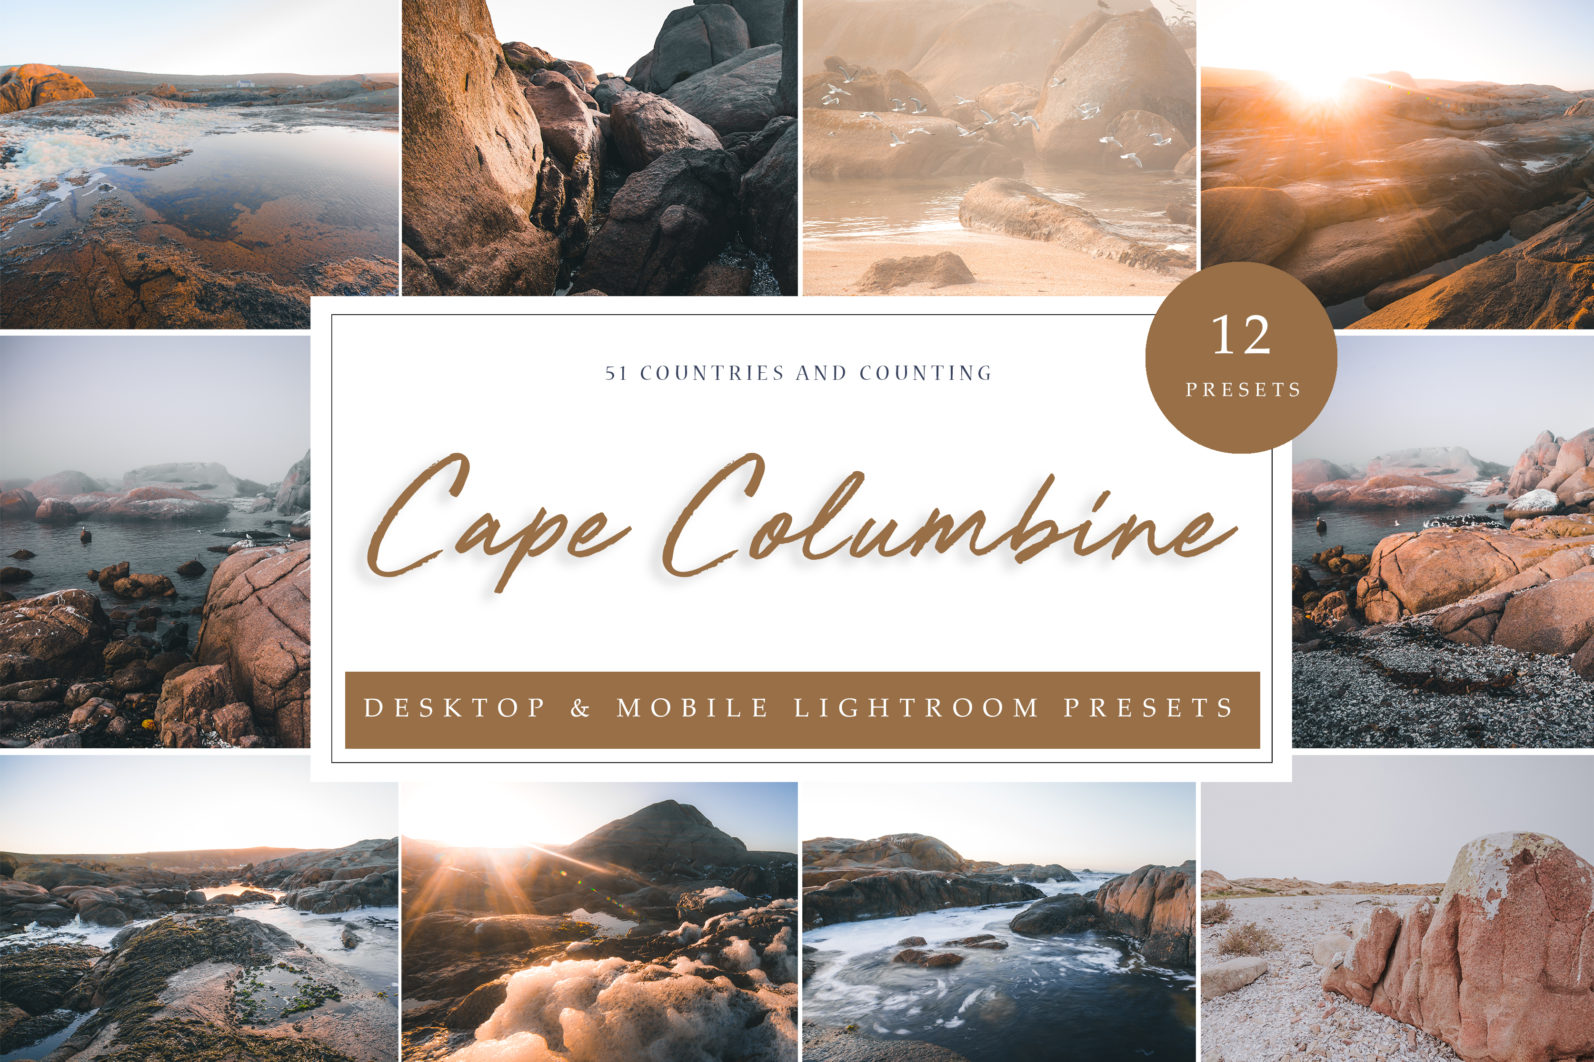 12 x Lightroom Presets, Cape Columbine, Beach and Ocean Presets, Seascape Presets - Cape Columbine LR scaled -